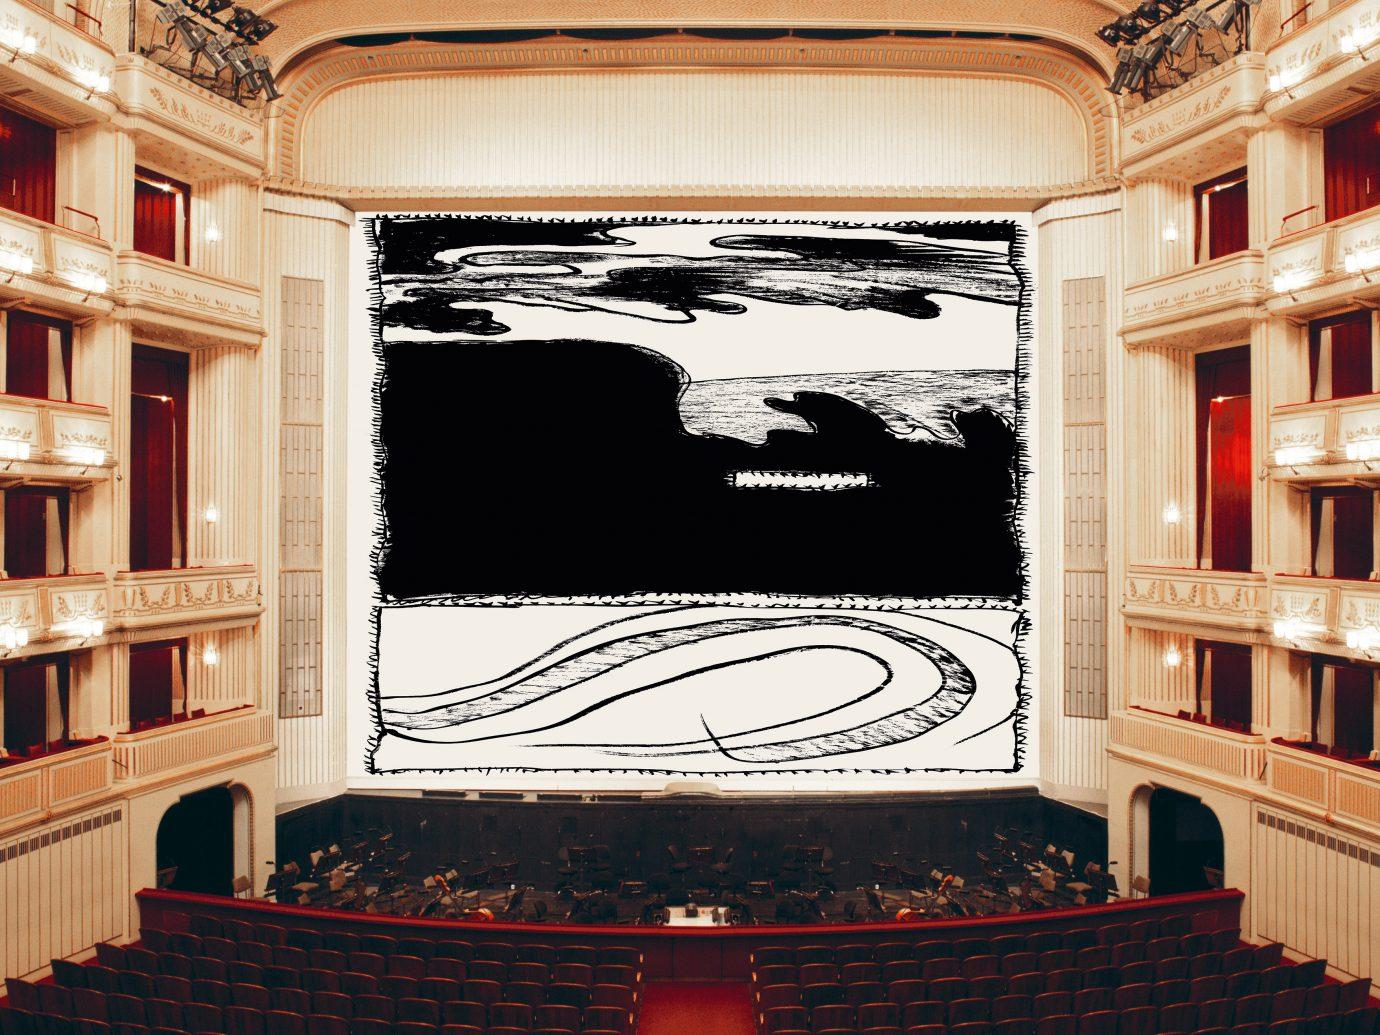 view of Wiener Staatsoper from the balcony